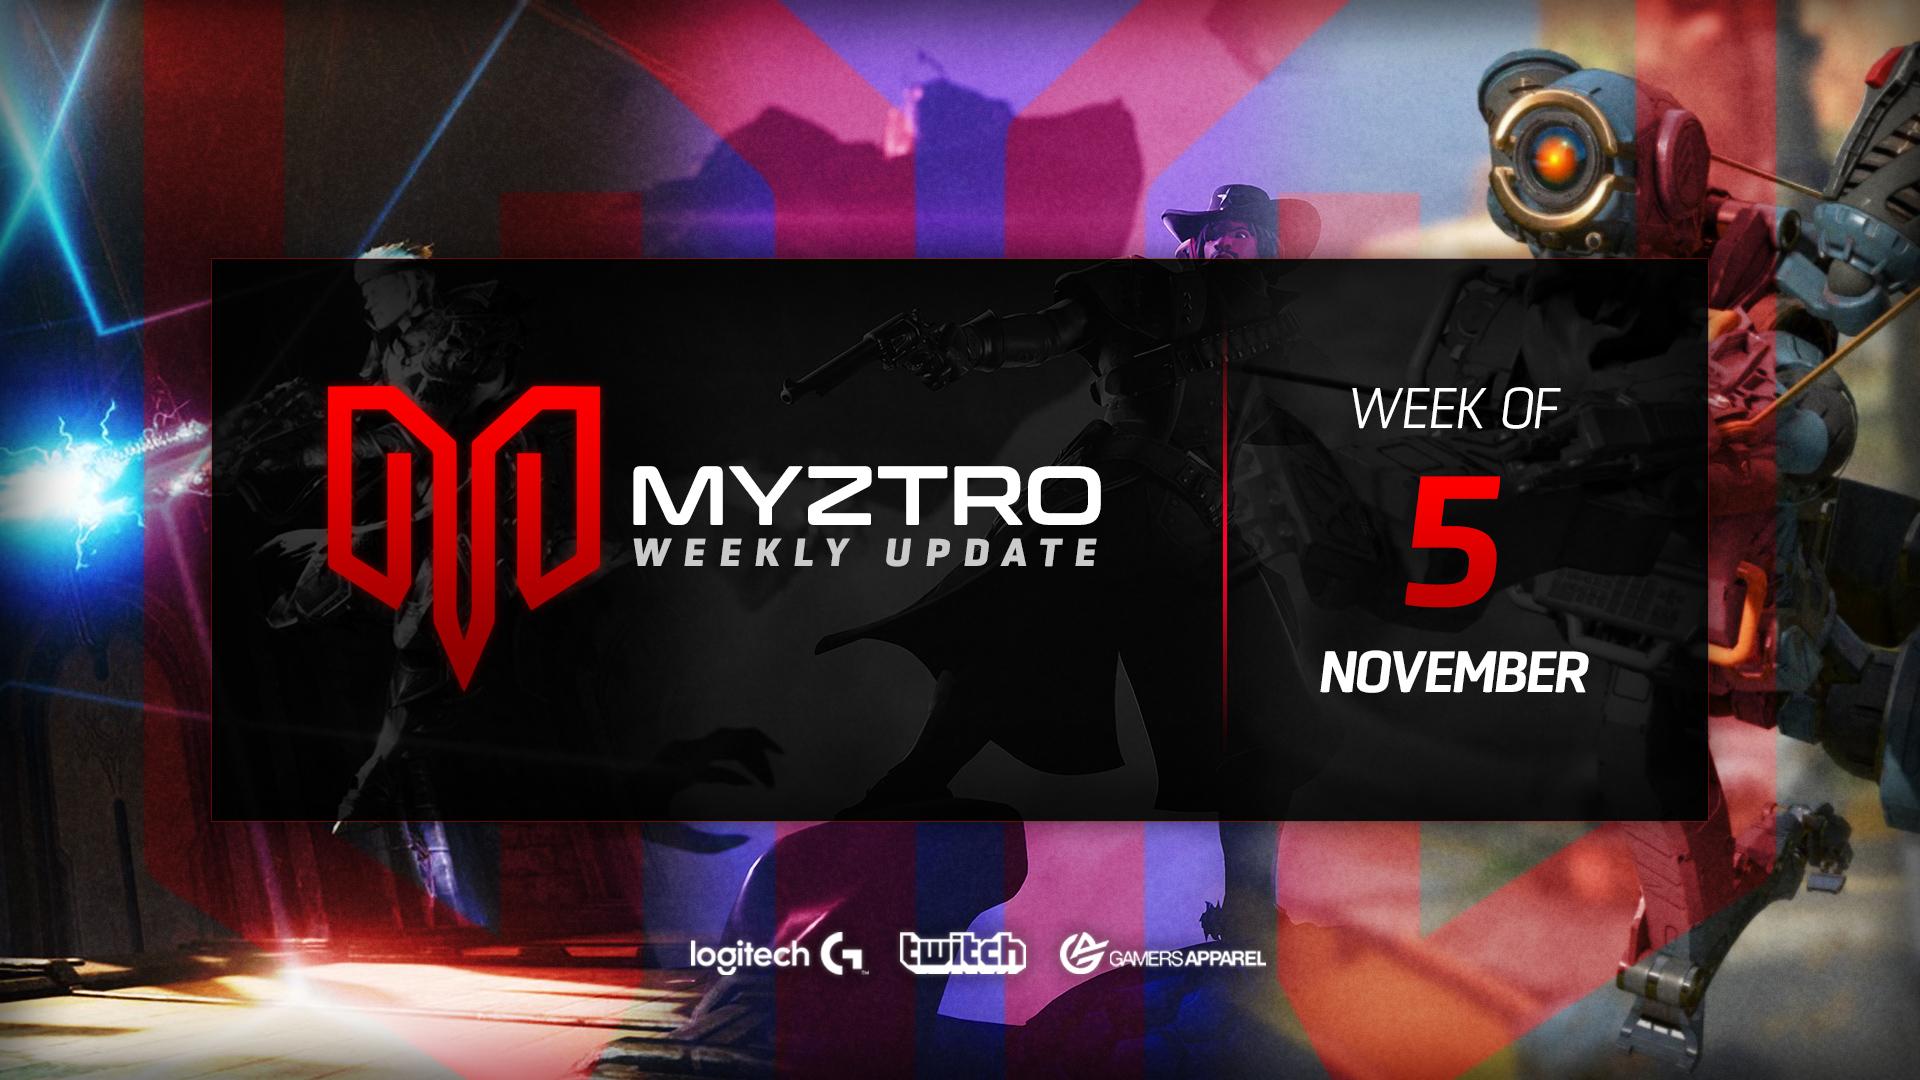 Myztro Weekly Update 5: 11/5/19